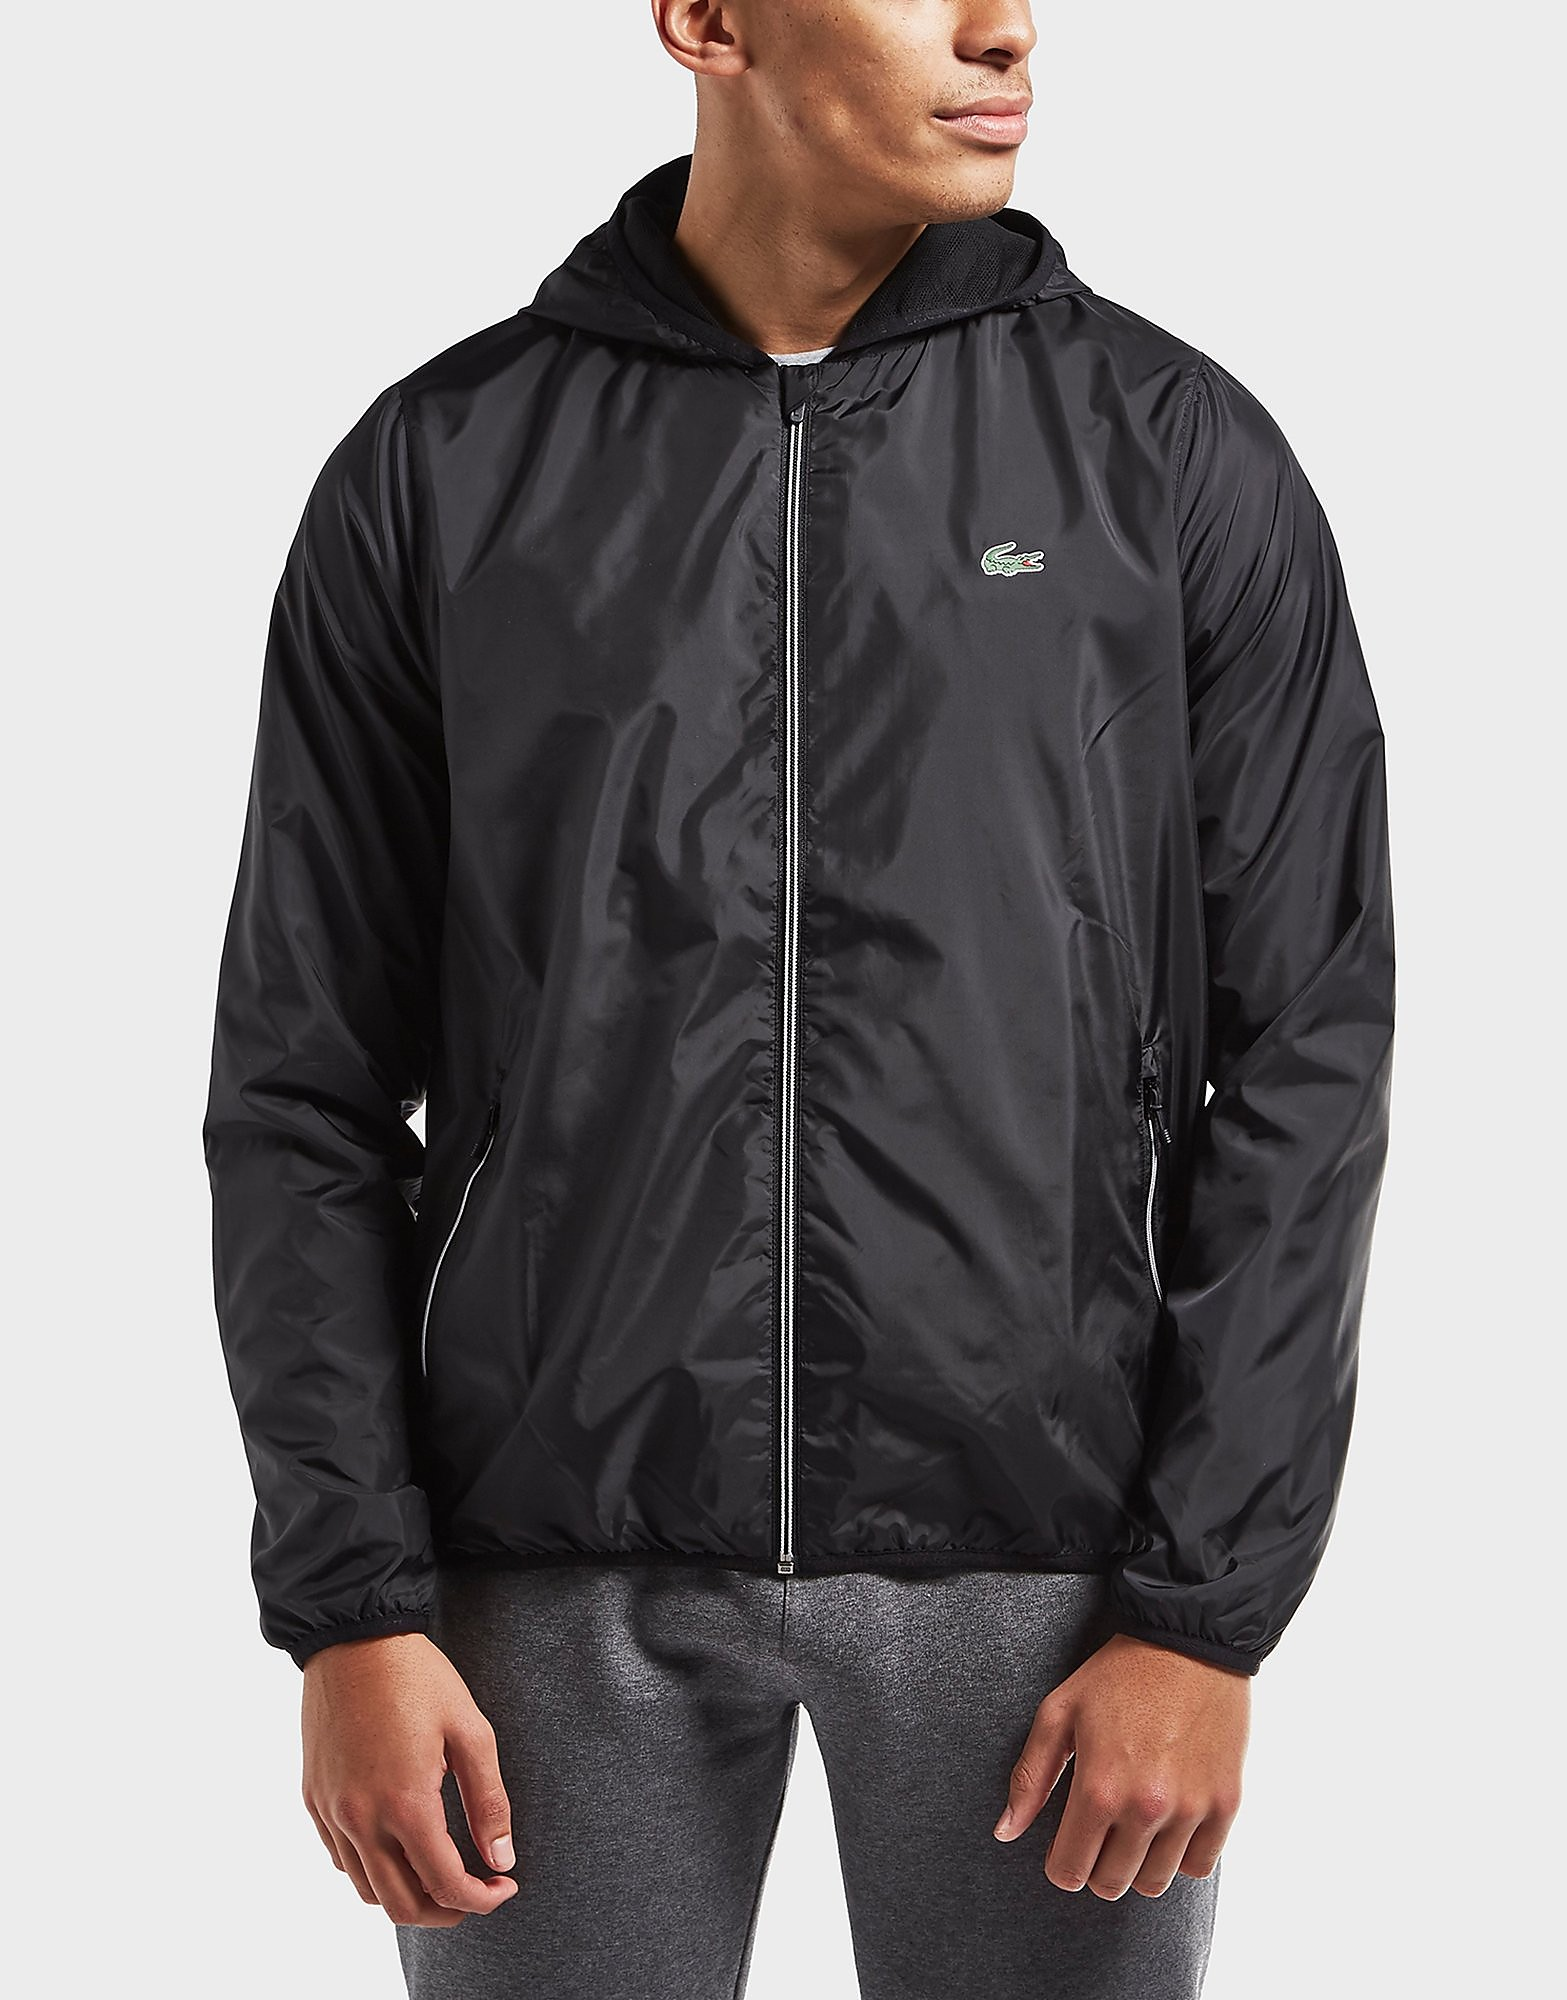 Lacoste Lightweight Hooded Jacket